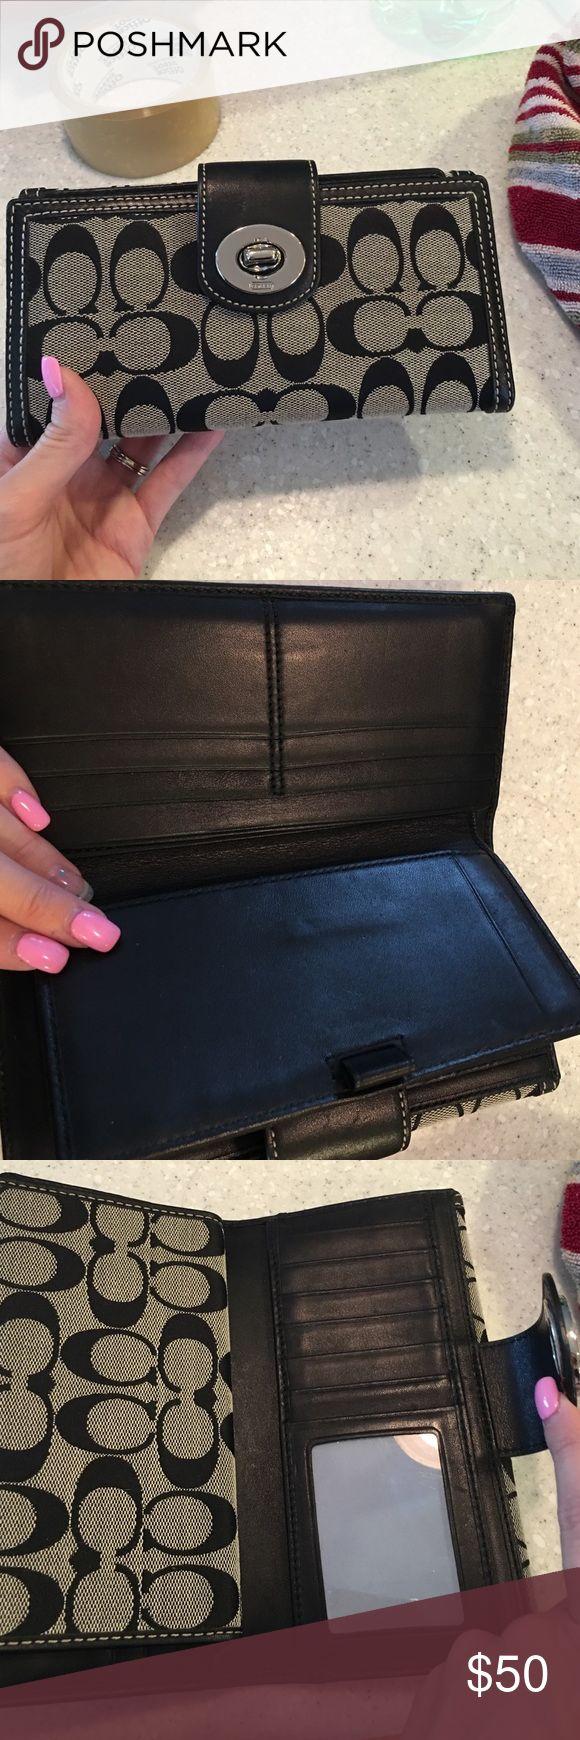 Coach wallet great condition Coach wallet great condition Coach Bags Wallets